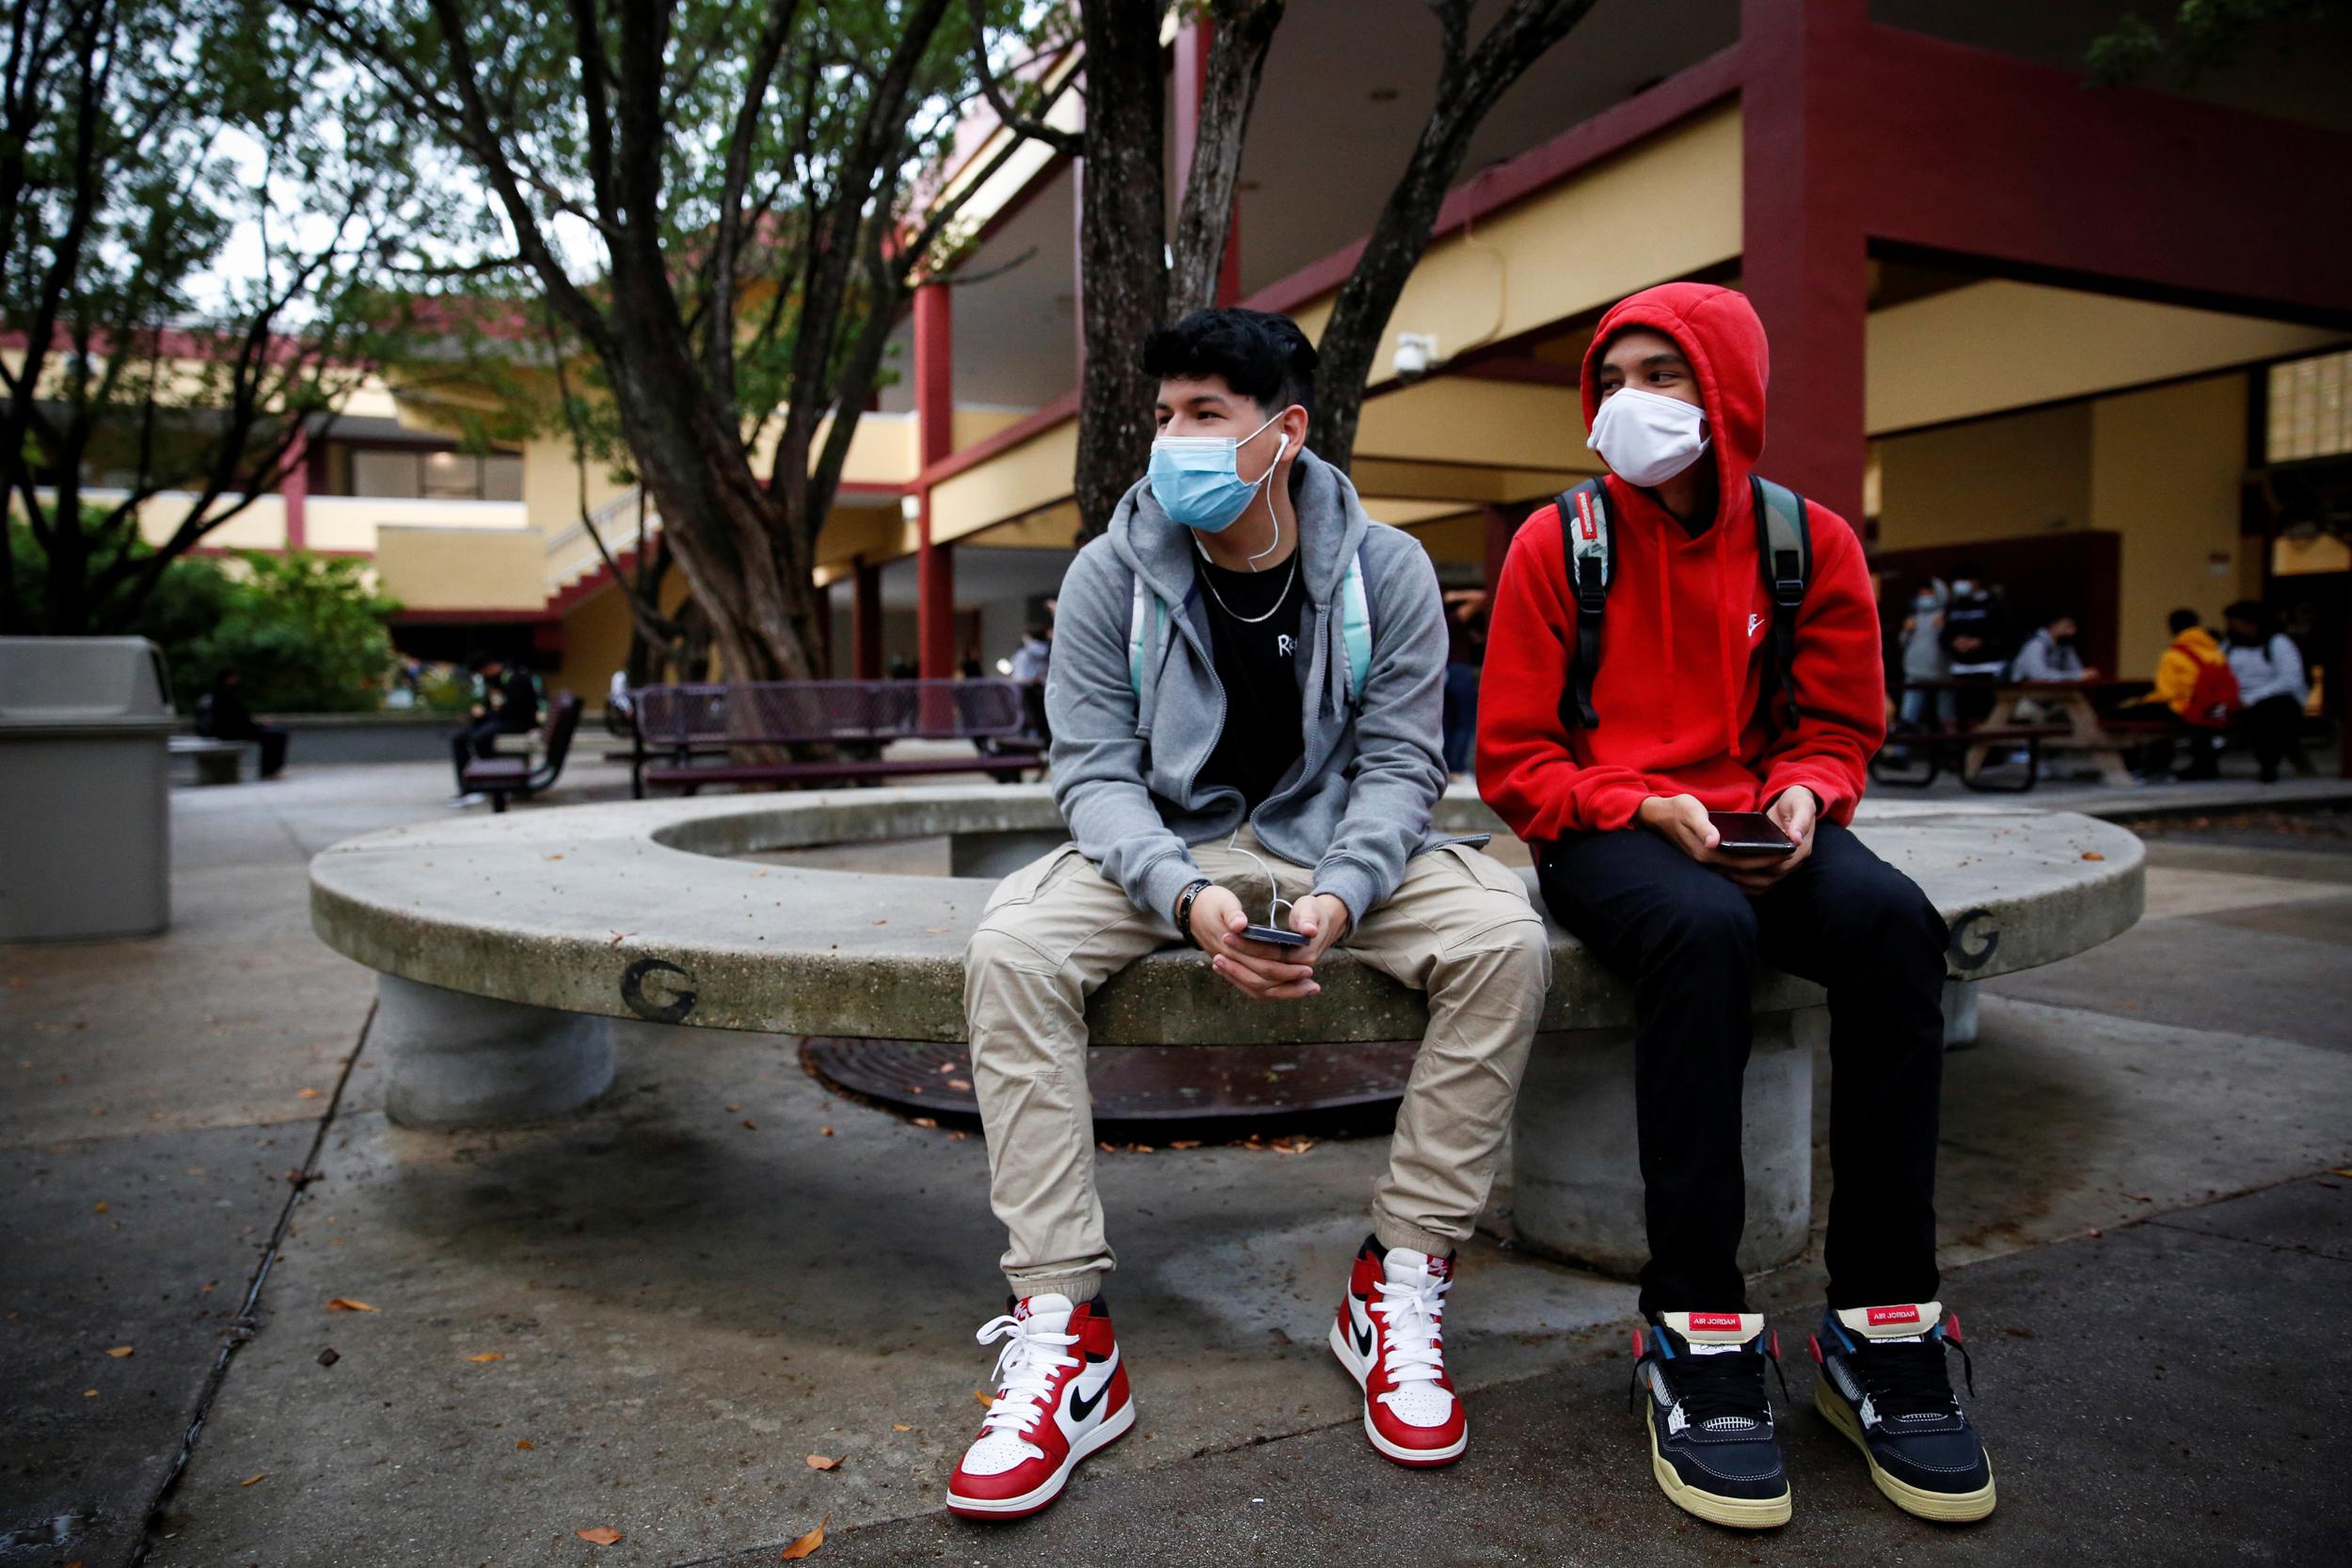 DeSantis files emergency appeal after judge says Florida must allow school mask mandates